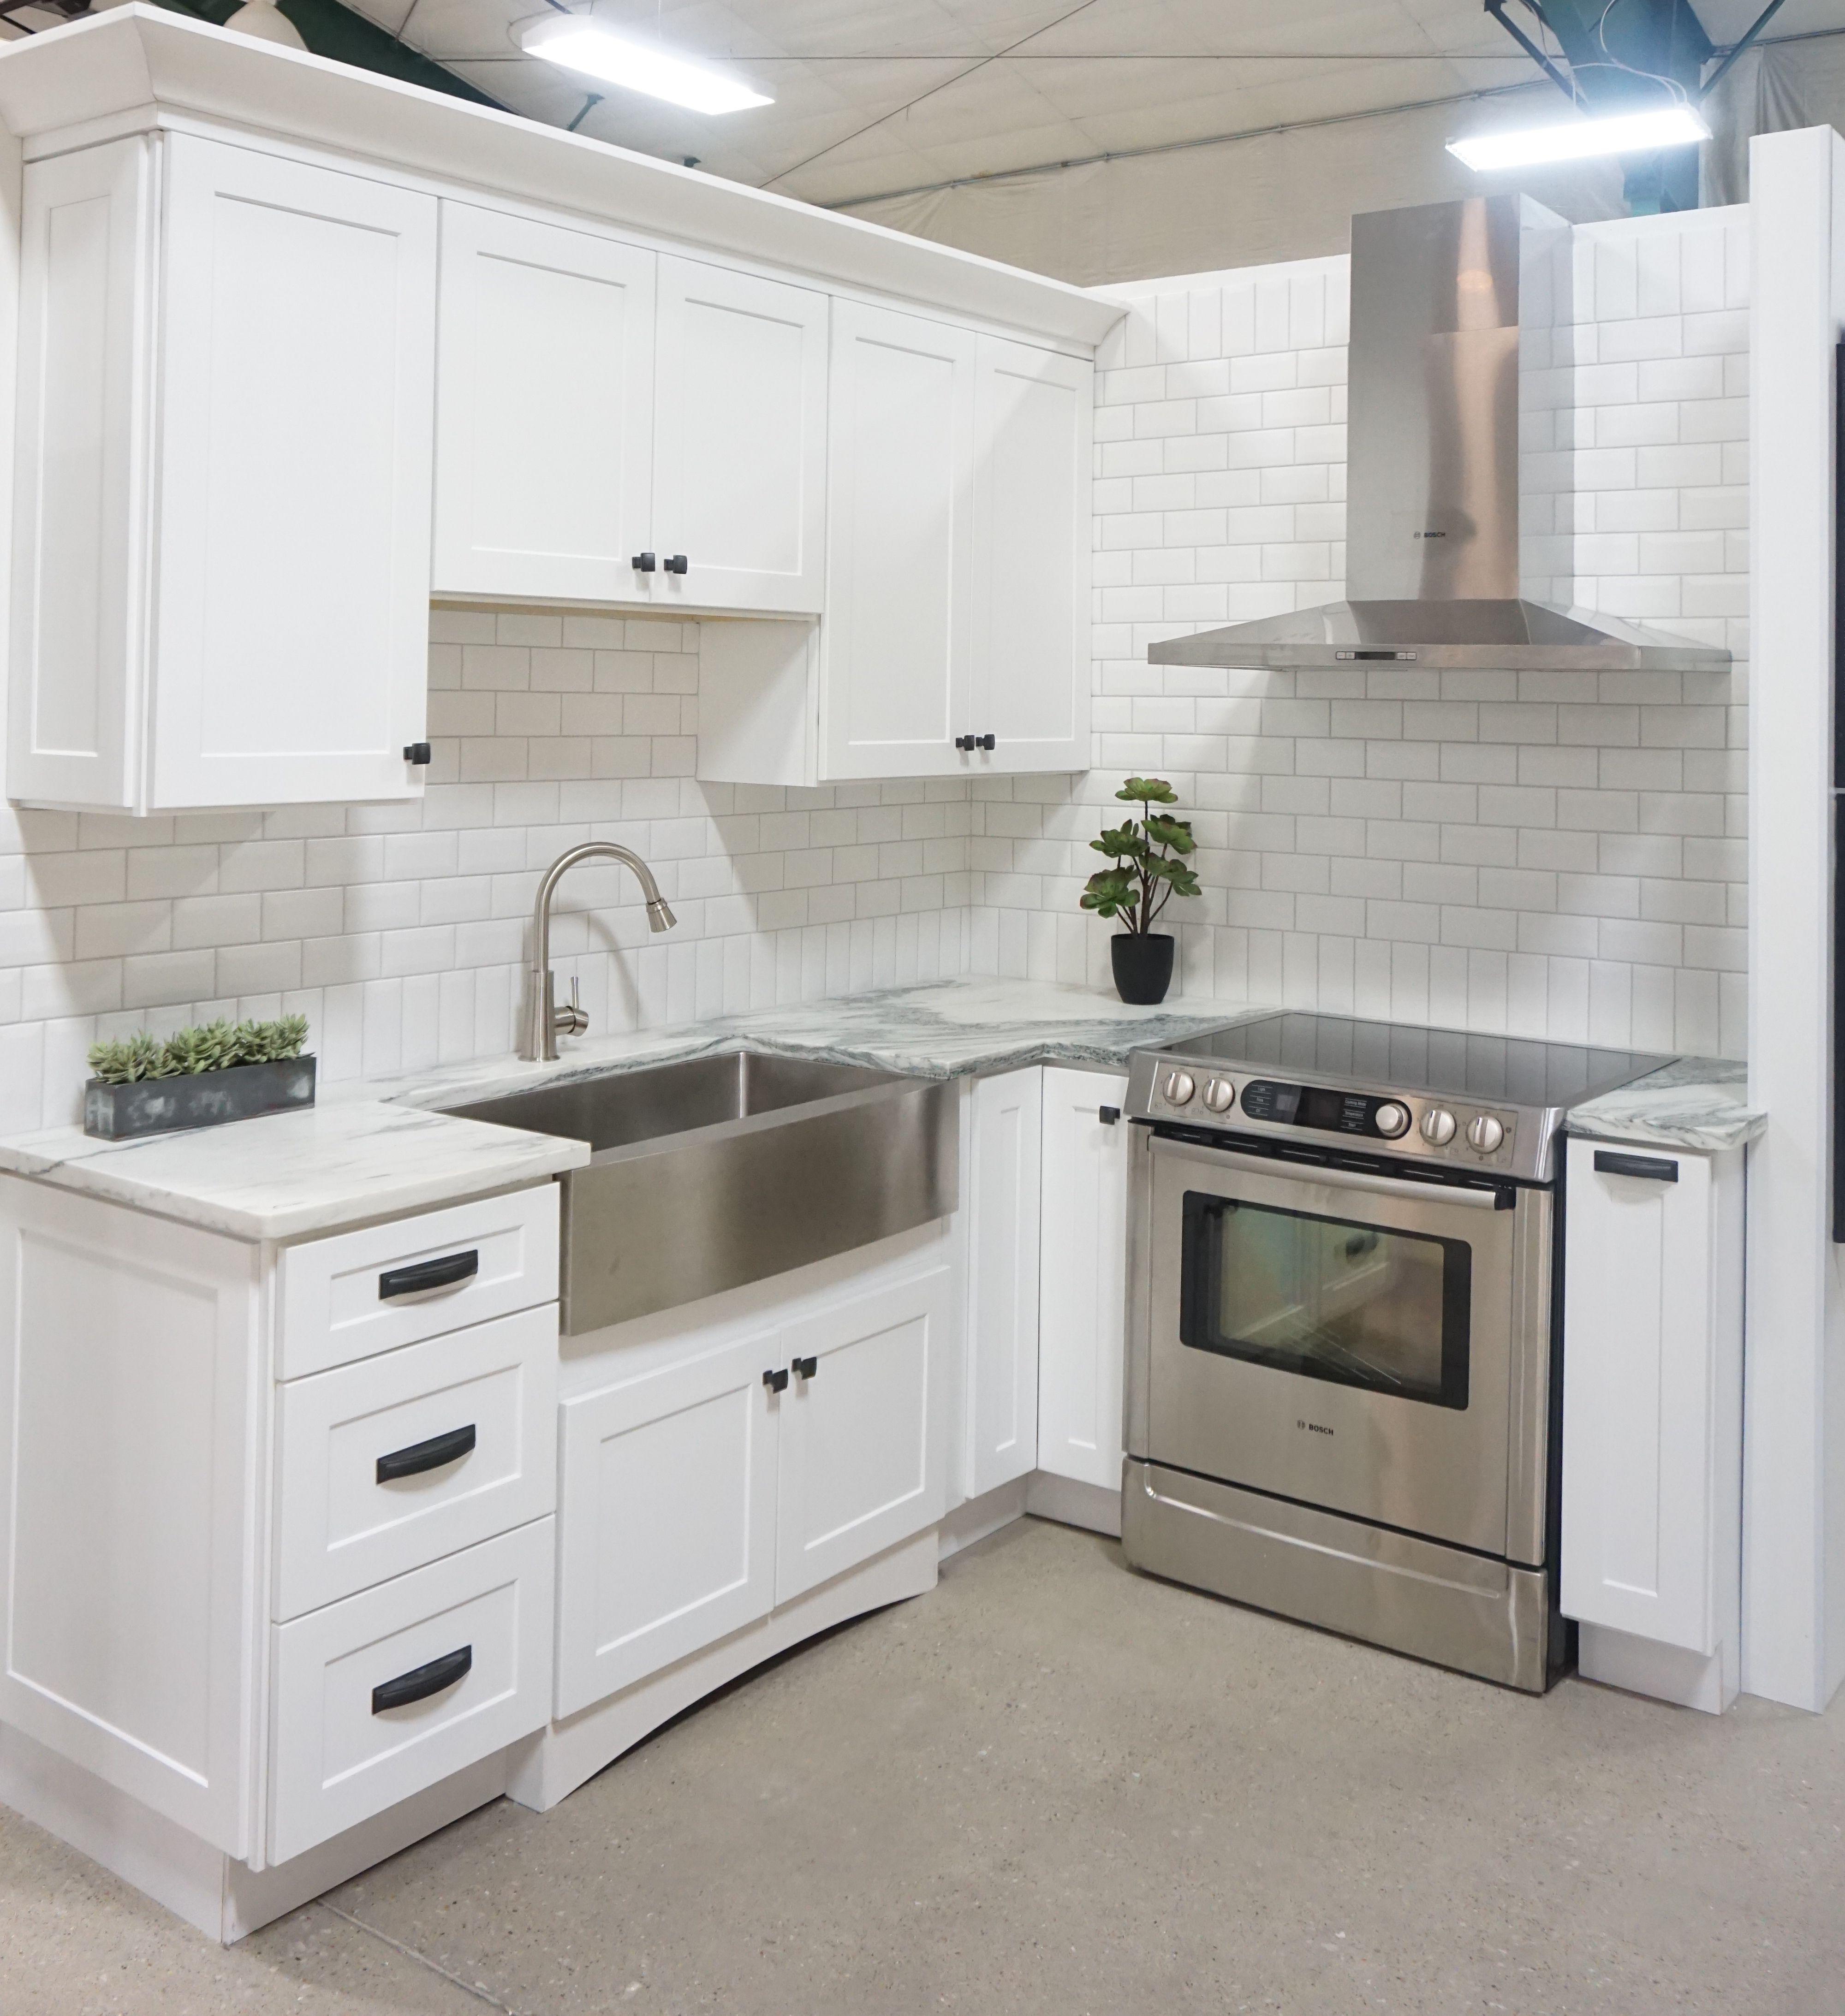 White Cabinets Shaker Door Style White Marble Countertops White